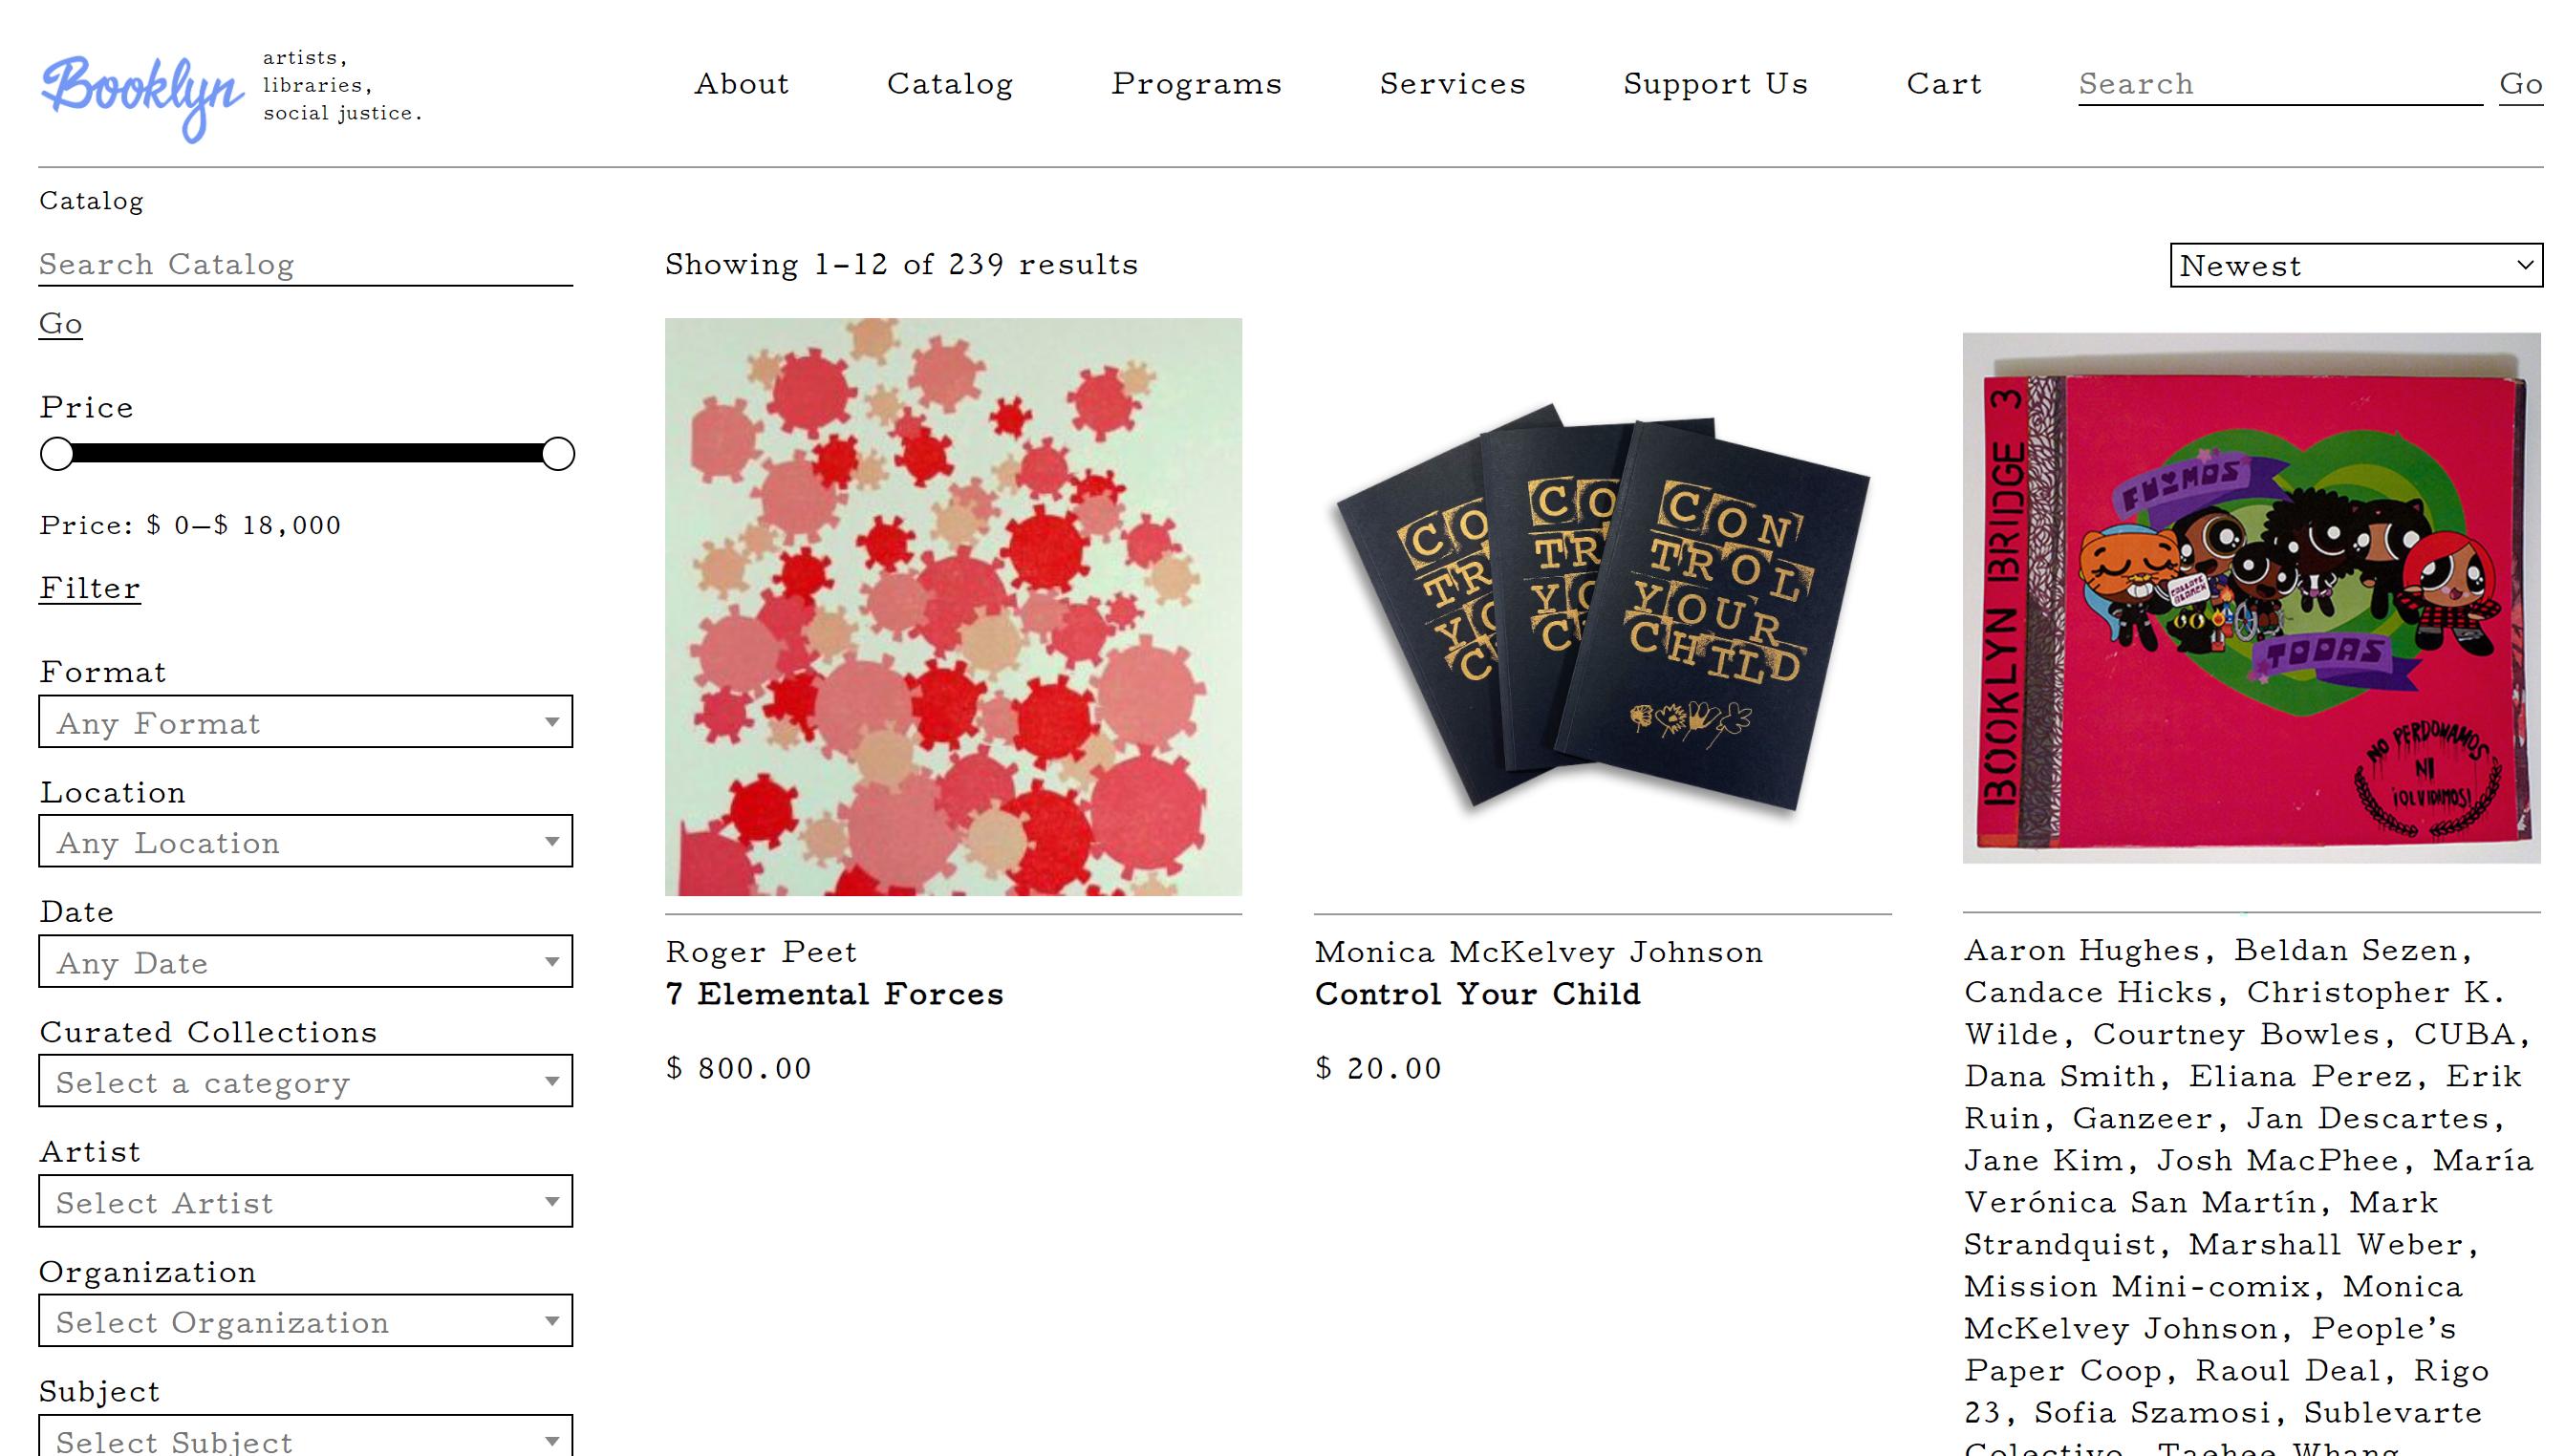 A screenshot of Booklyn's catalog